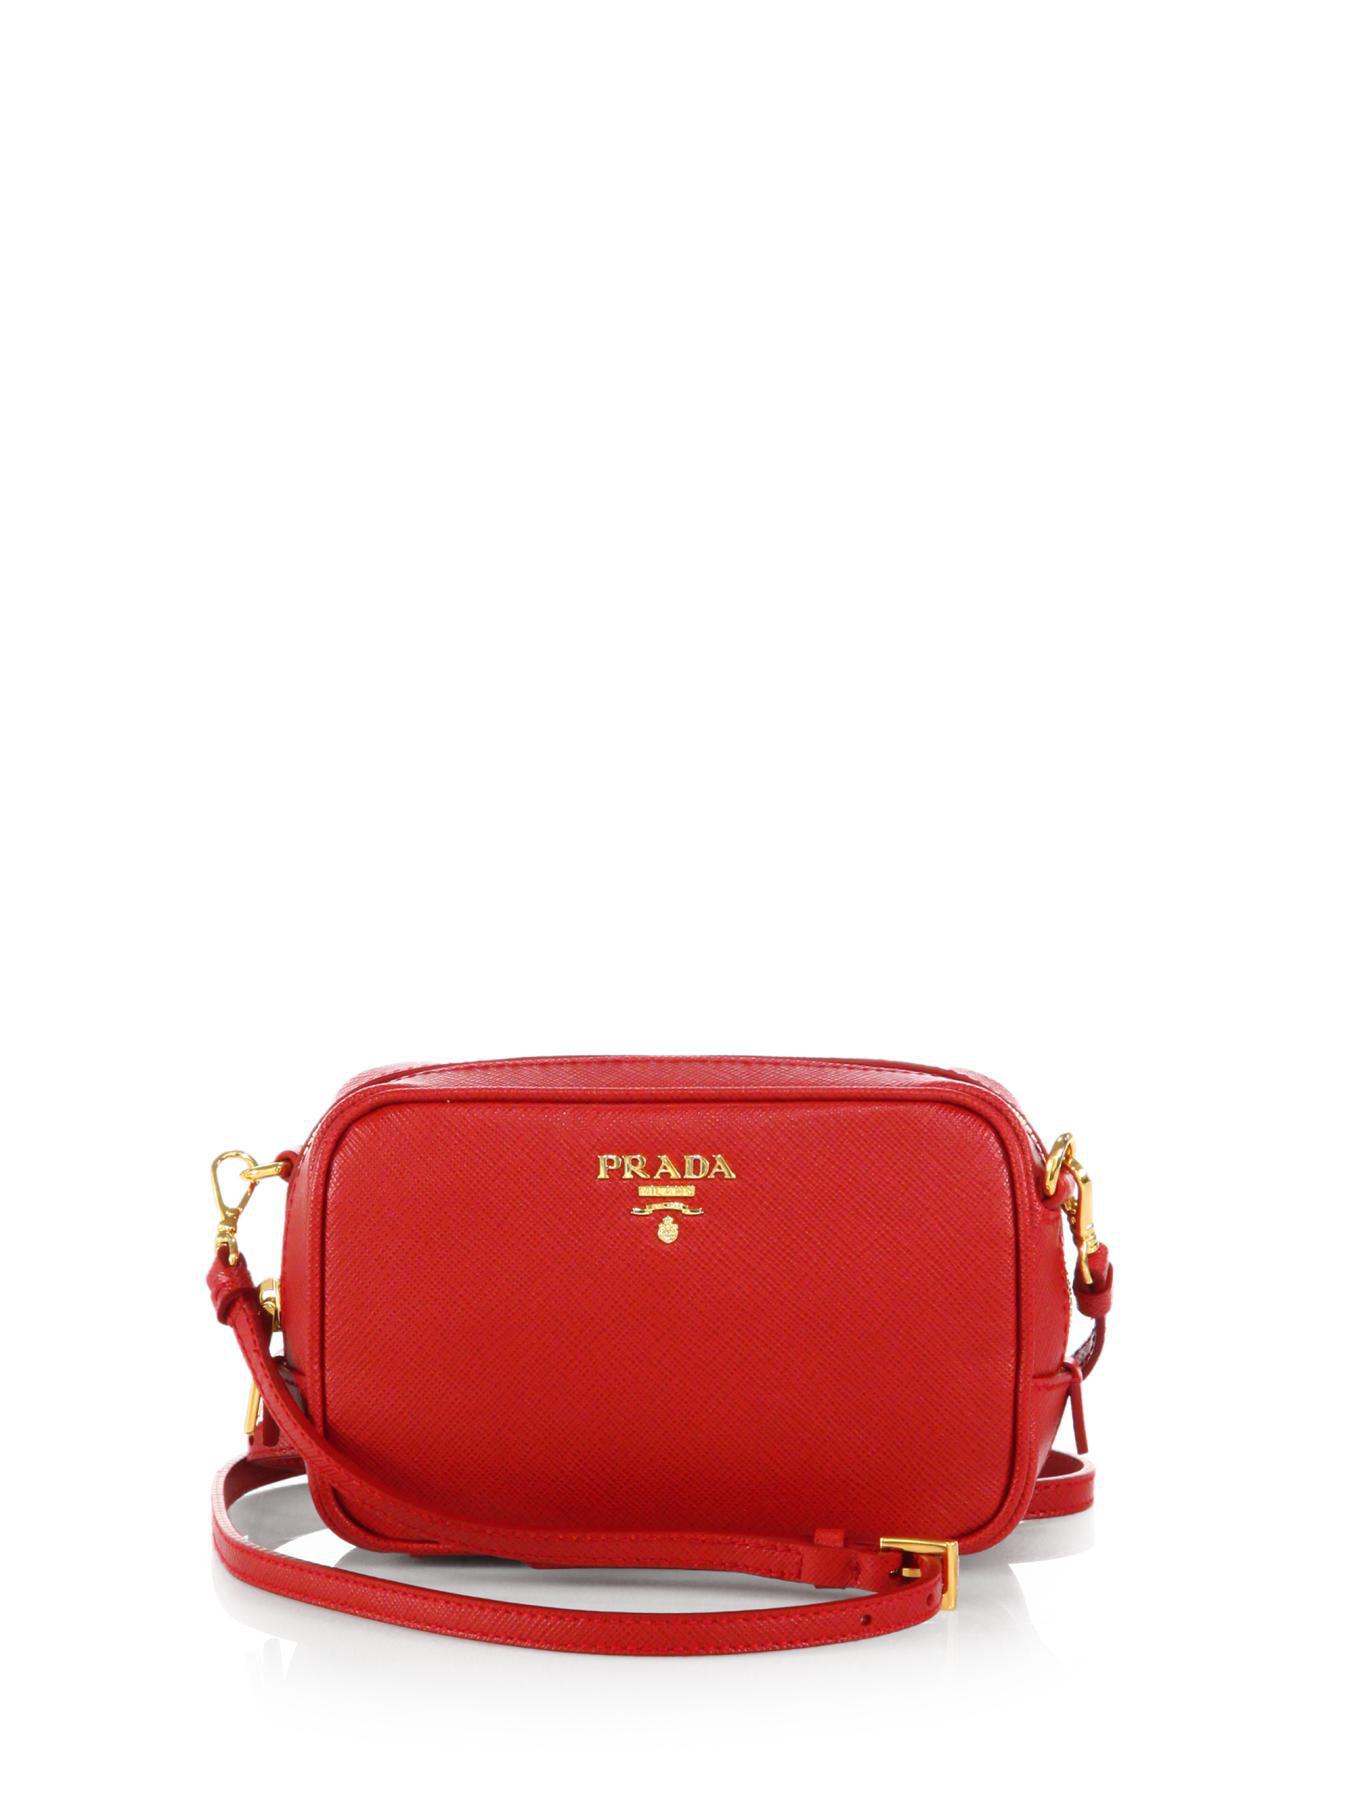 00163346a256dc Prada Saffiano Leather Camera Bag in Red - Lyst